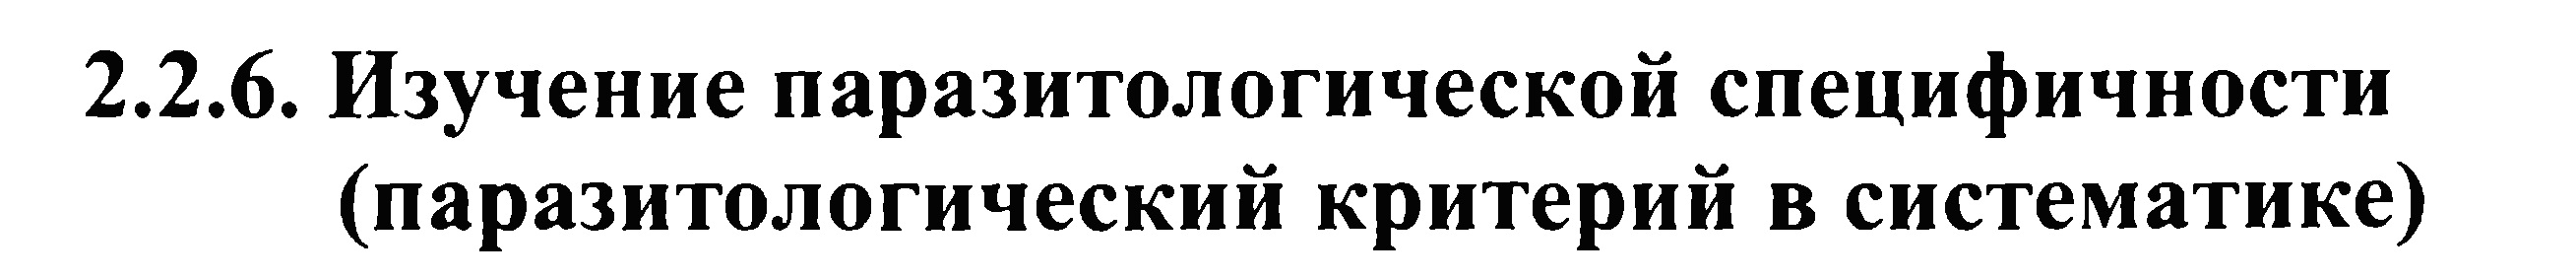 стр.30_(Круглов, 2005).jpg